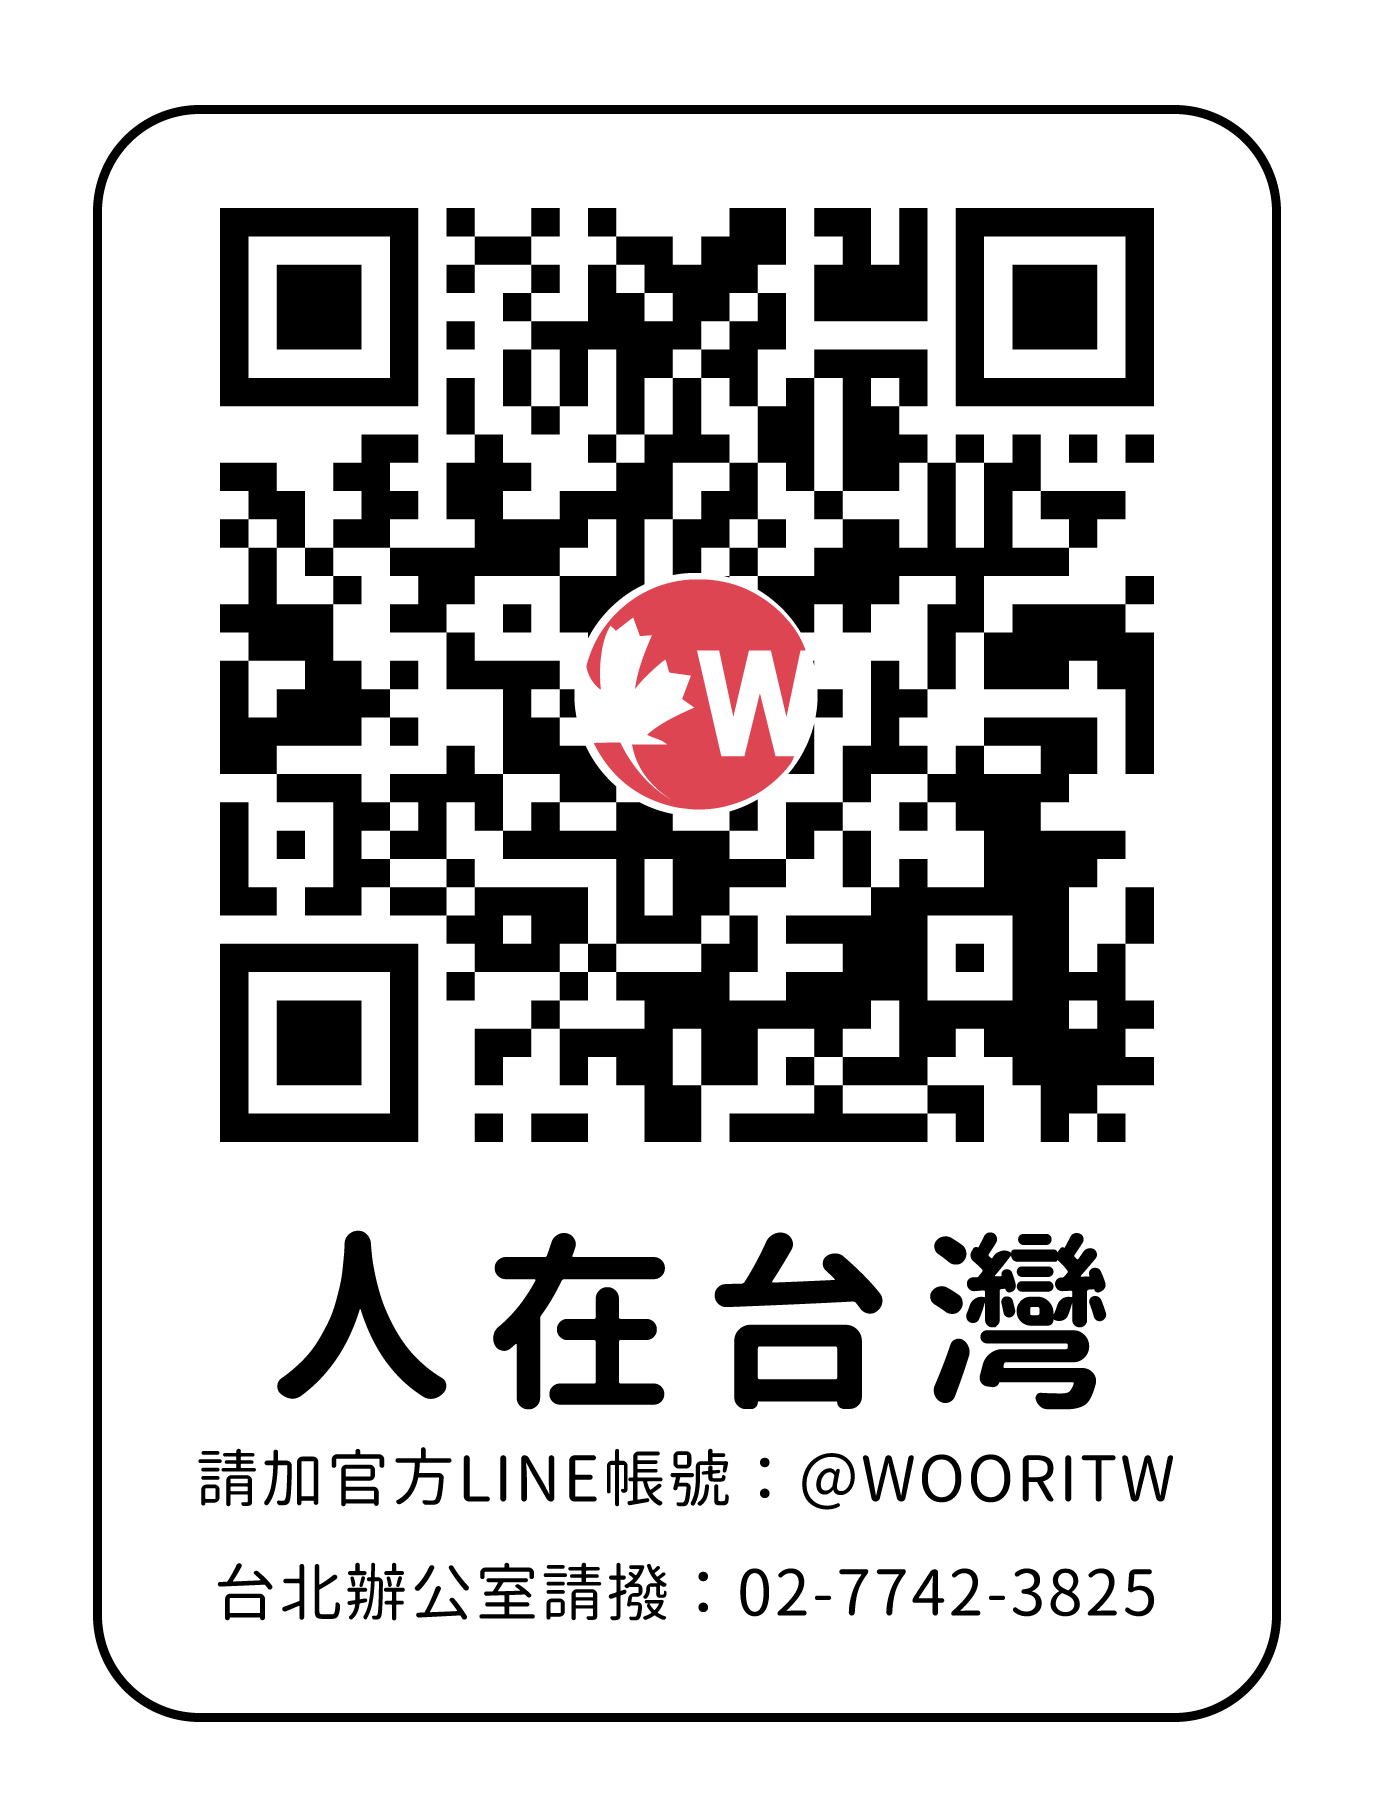 WOORI-台灣聯絡方法-QR-code